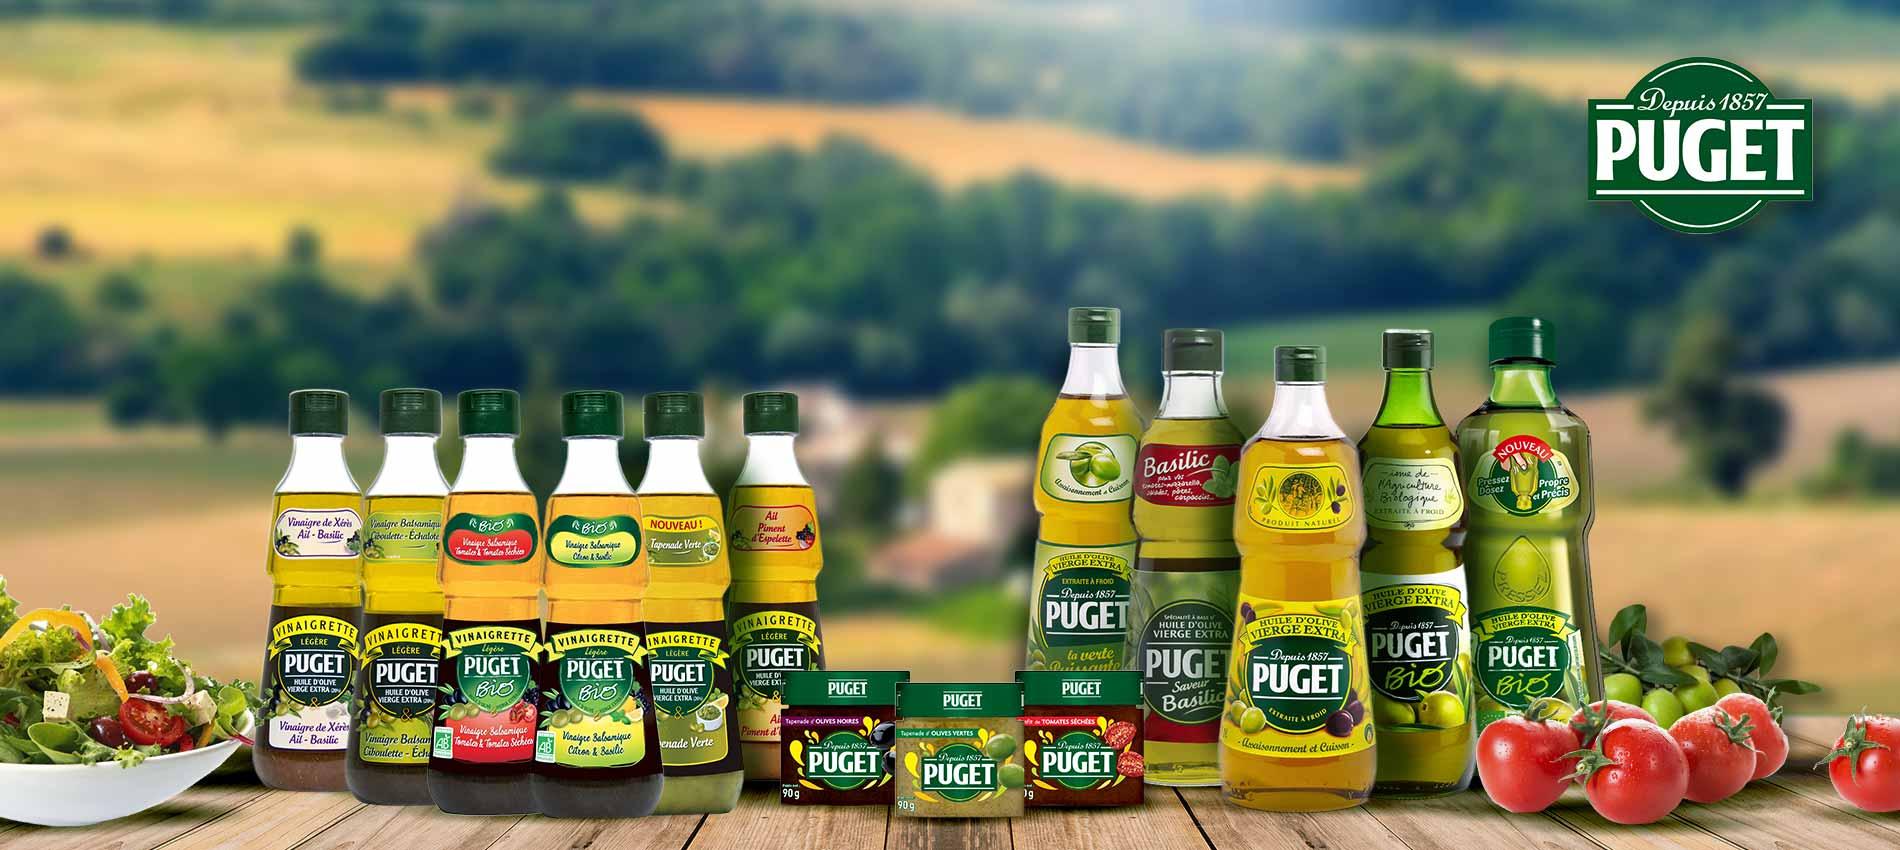 Gamme produits Puget